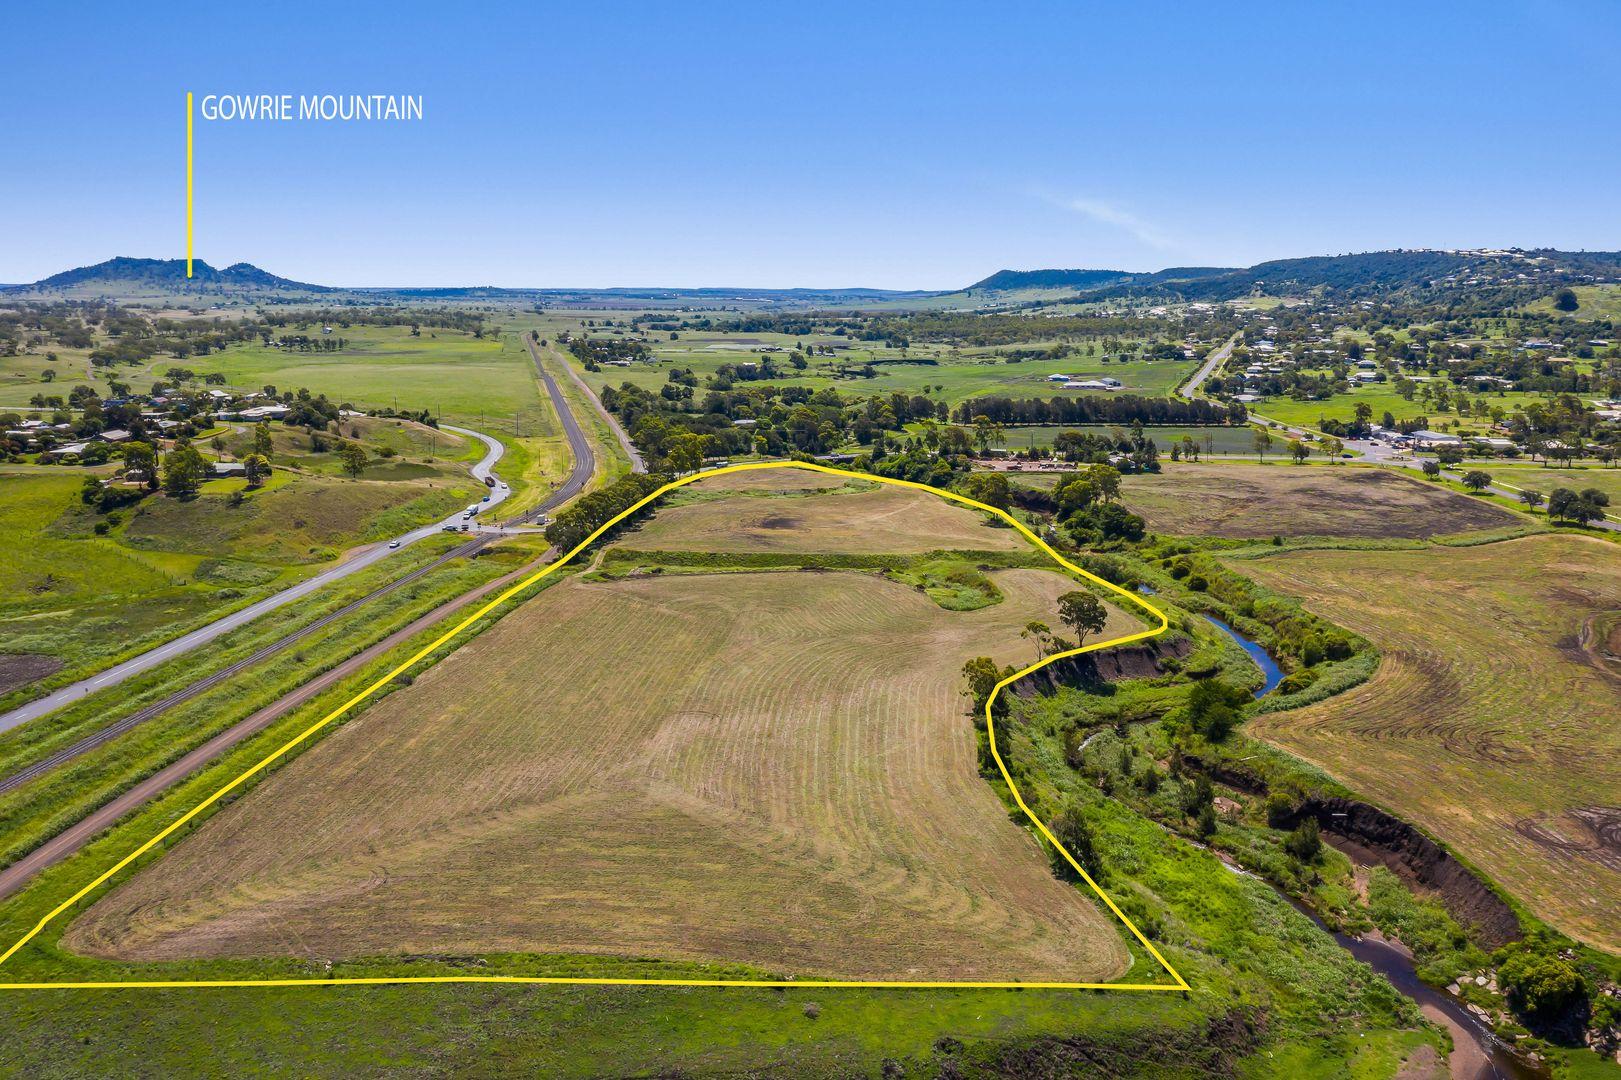 Lot 2 Cnr Old Homebush & E Paulsens Roads, Gowrie Junction QLD 4352, Image 2